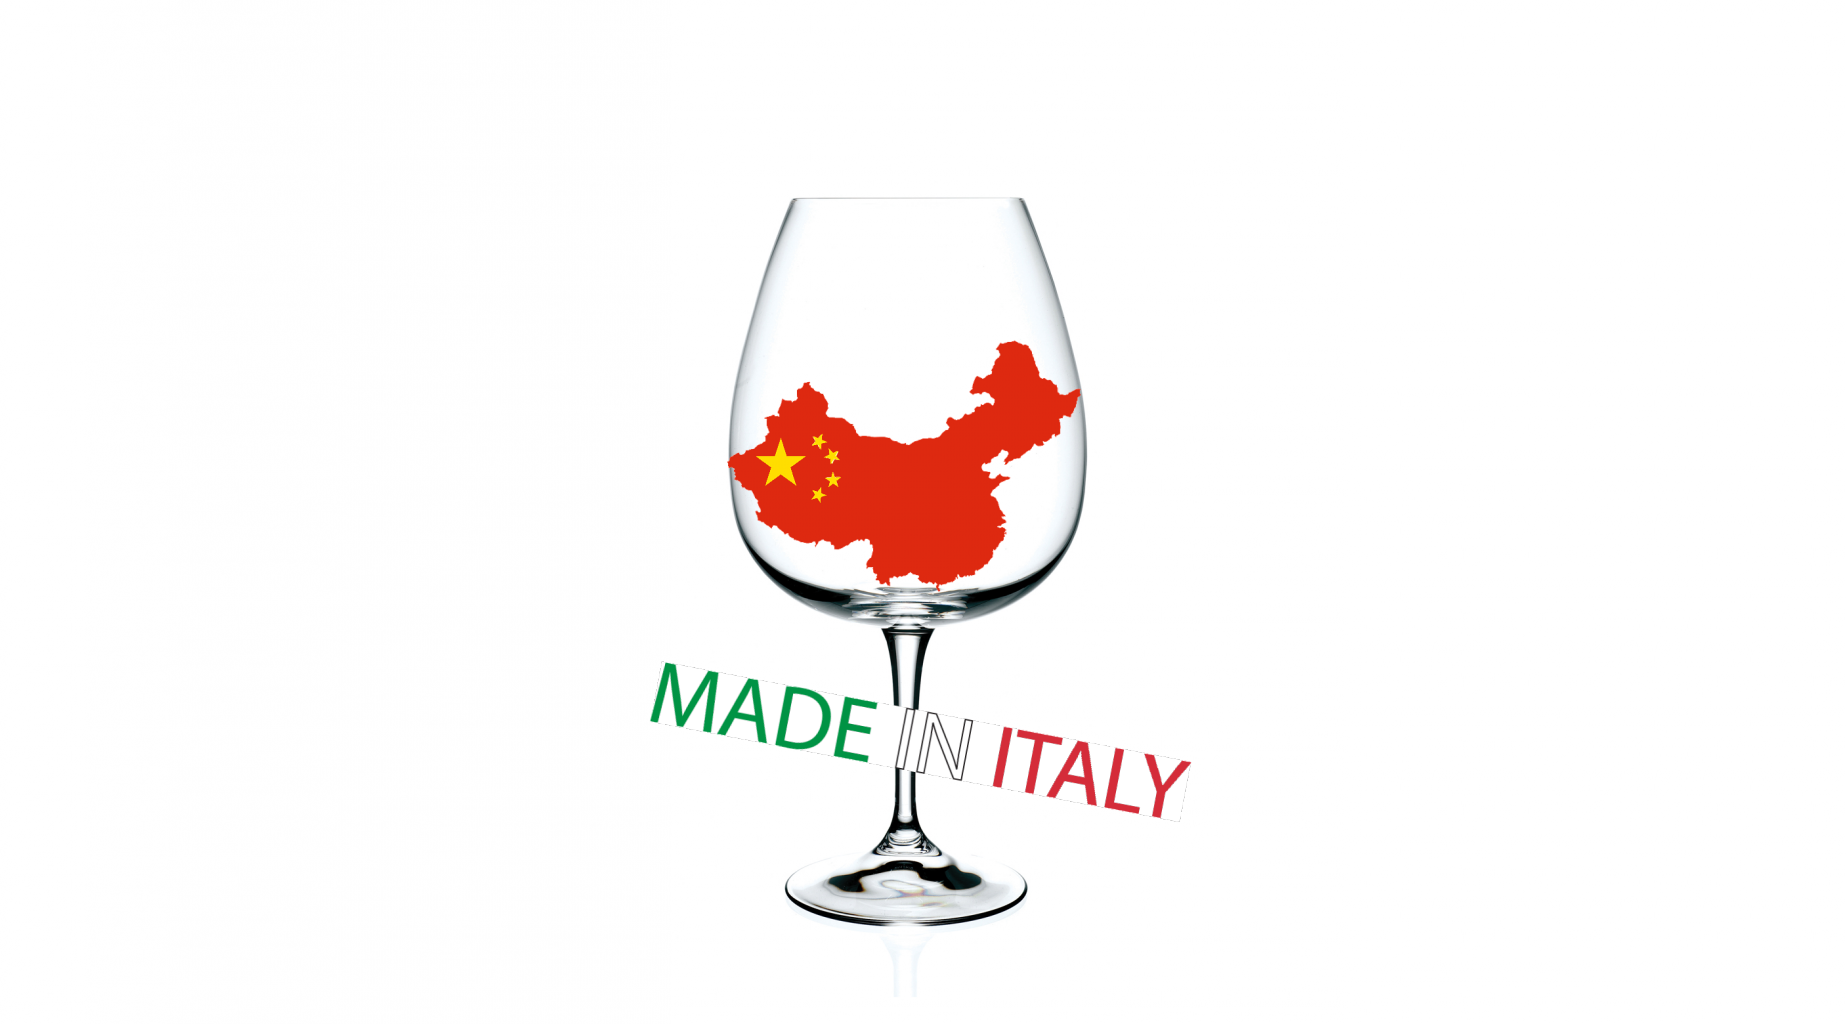 vino italiano export cina